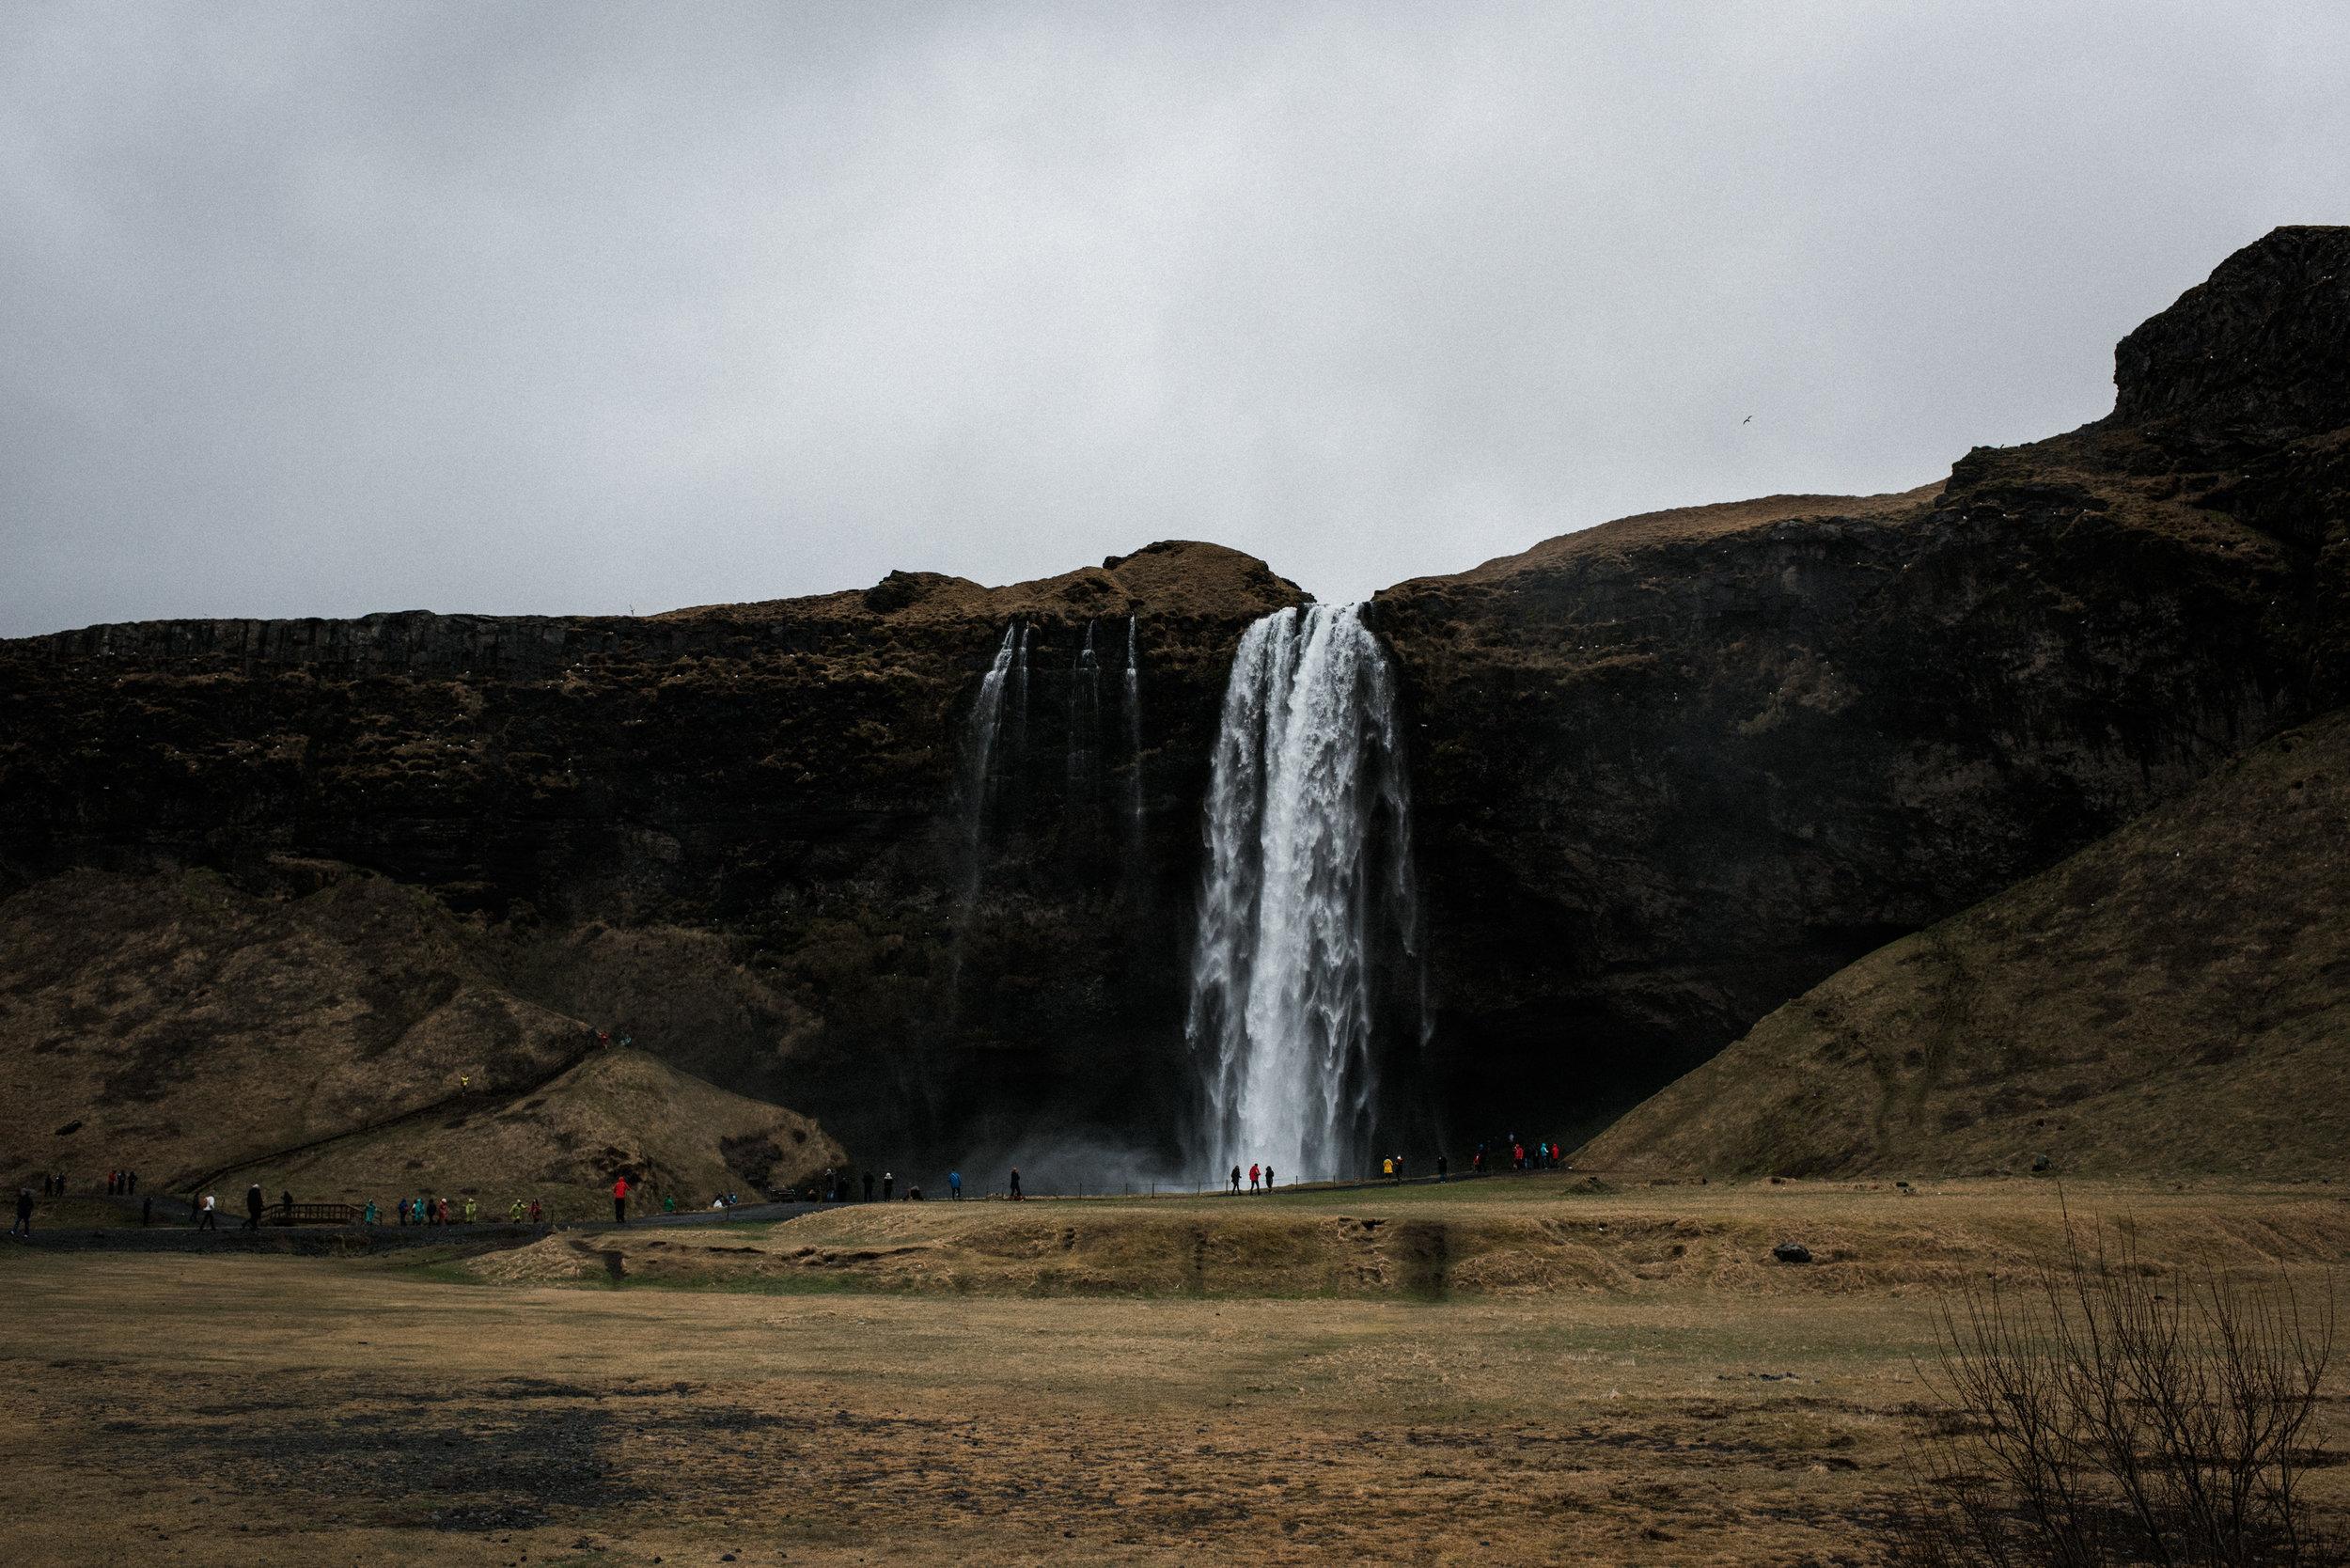 ICELAND_WOMAN_PHOTOGRAPHER_TARASHUPE_OUTDOOR_PHOTOGRAPHY_006.jpg